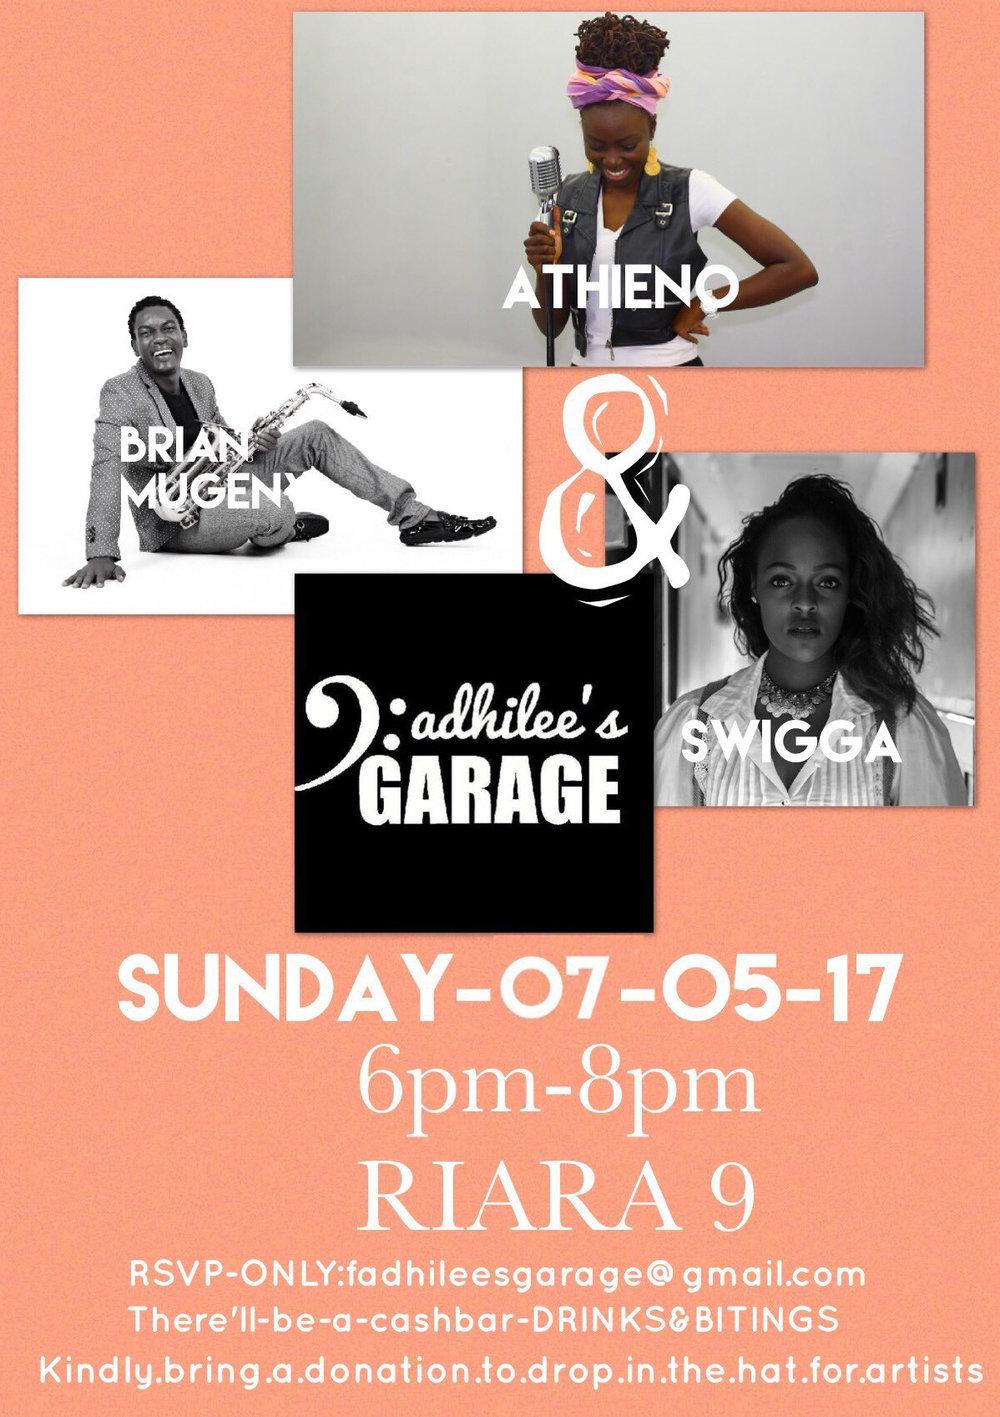 Fadhilee's Garage